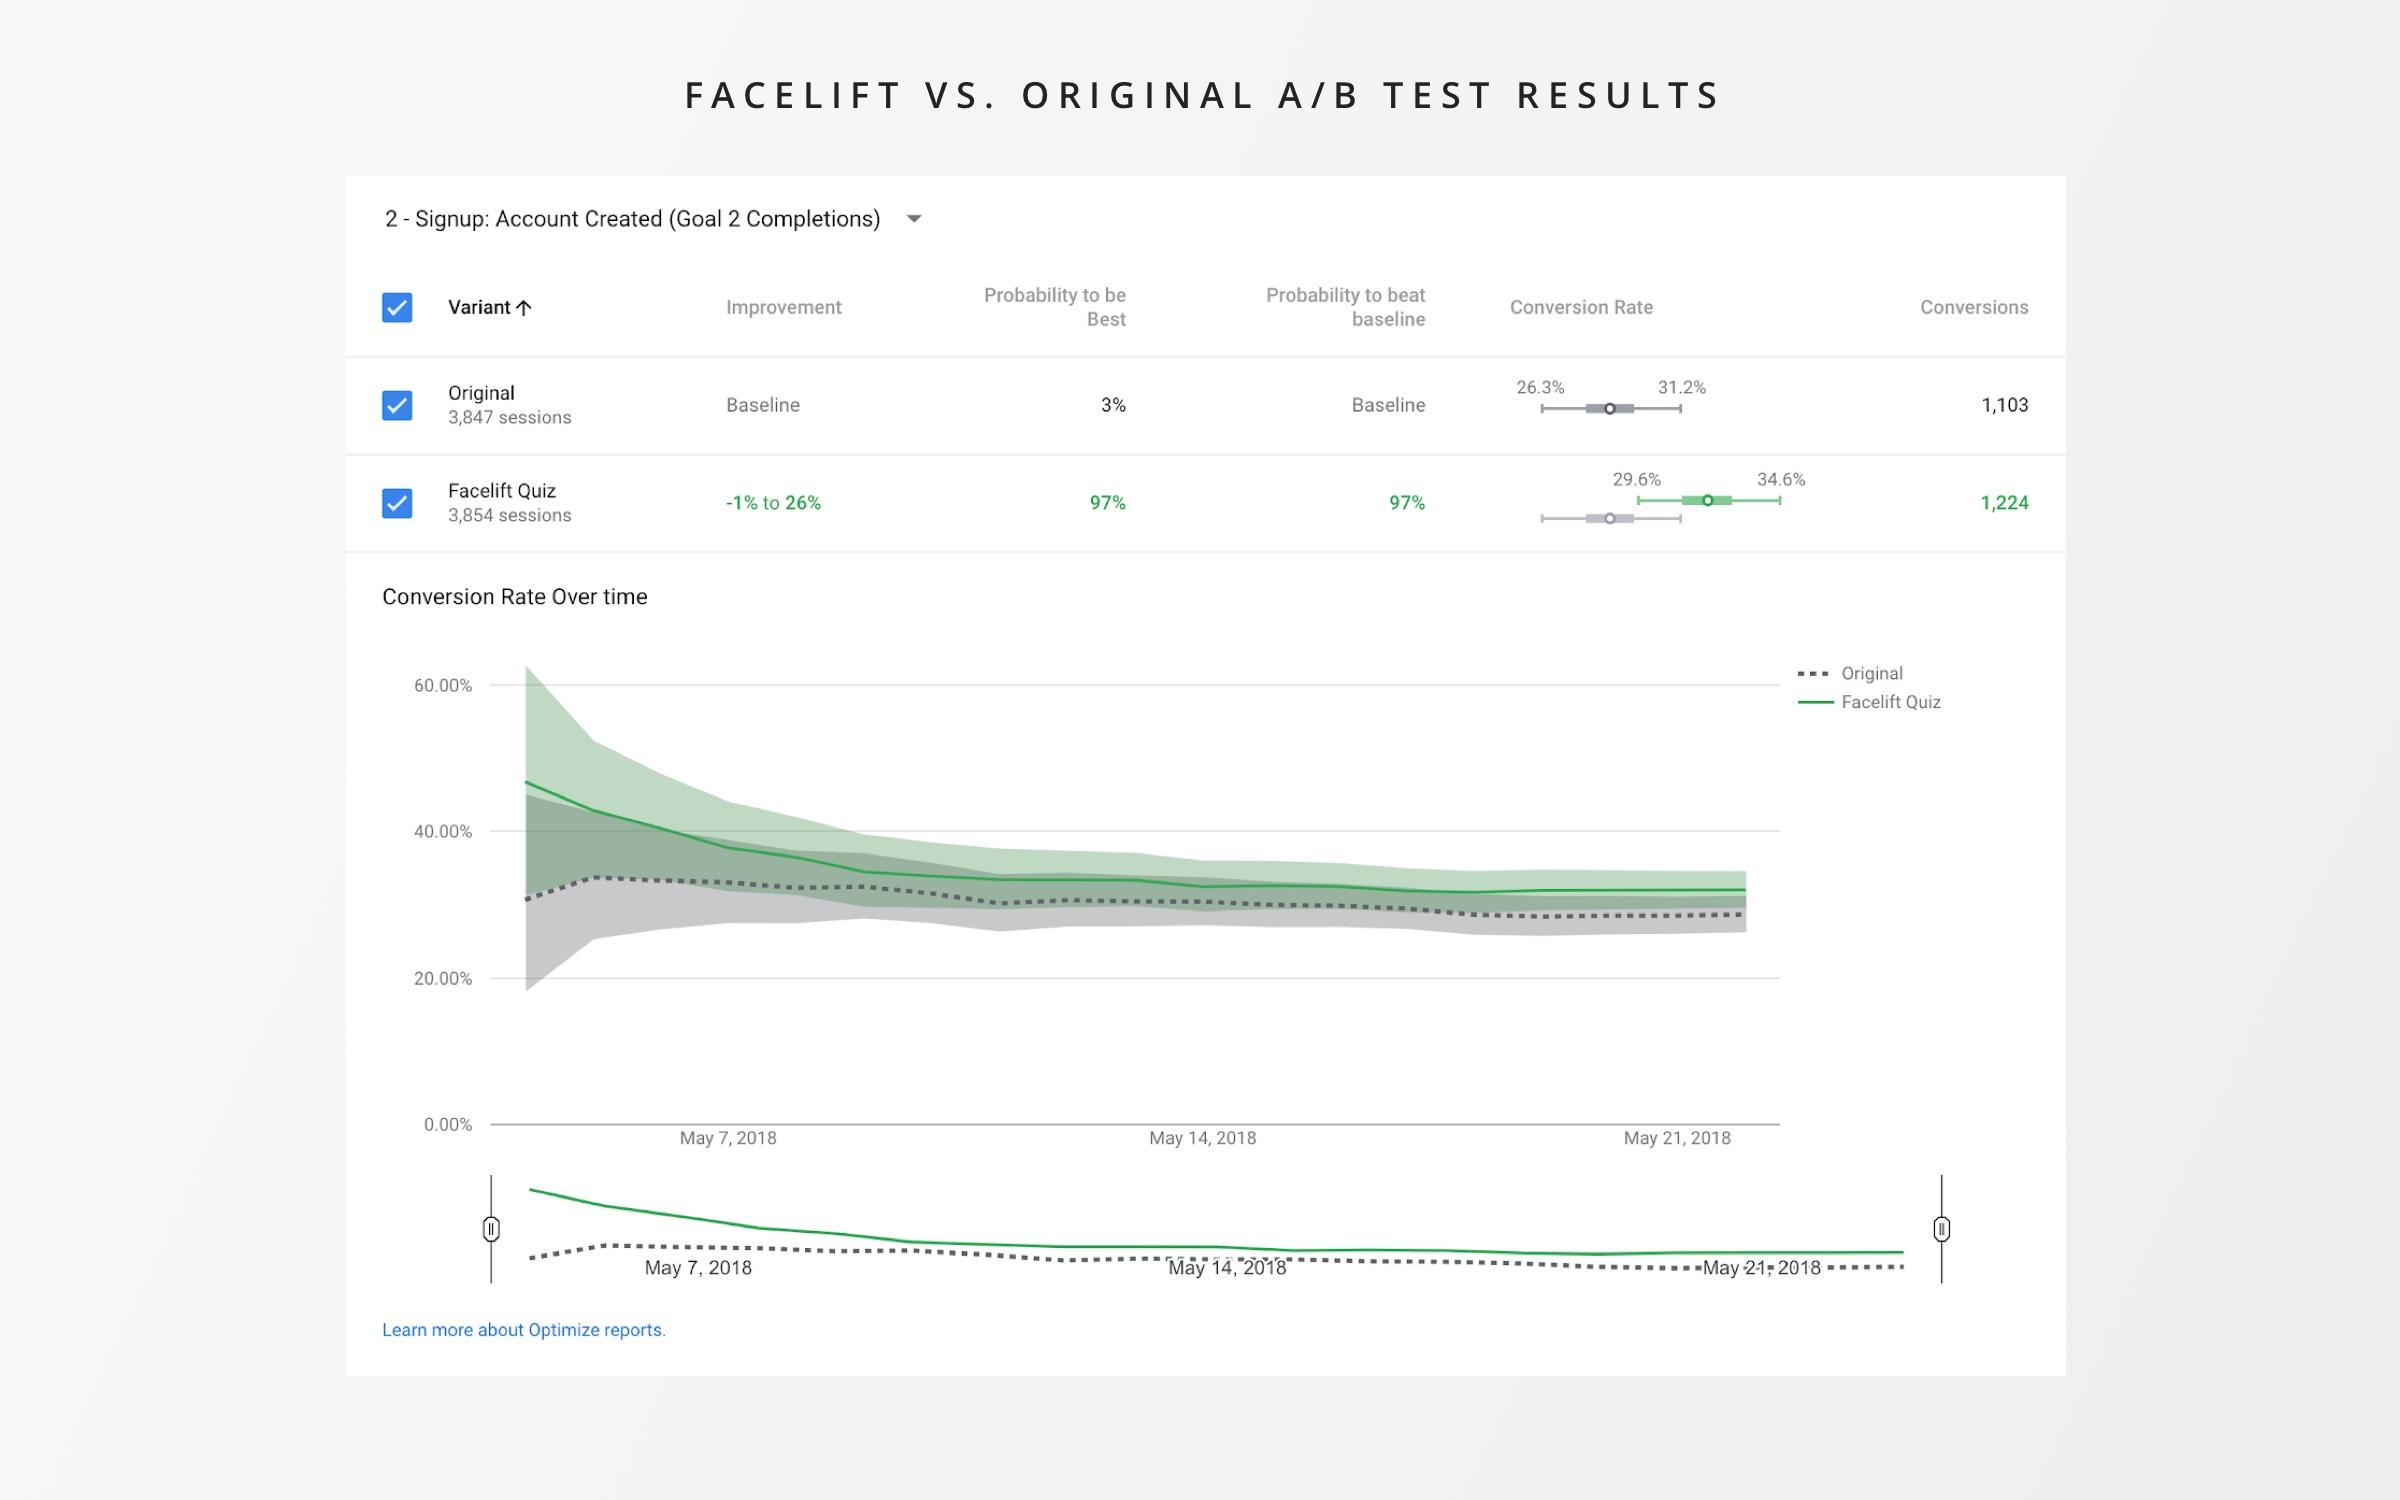 Facelift Test Results